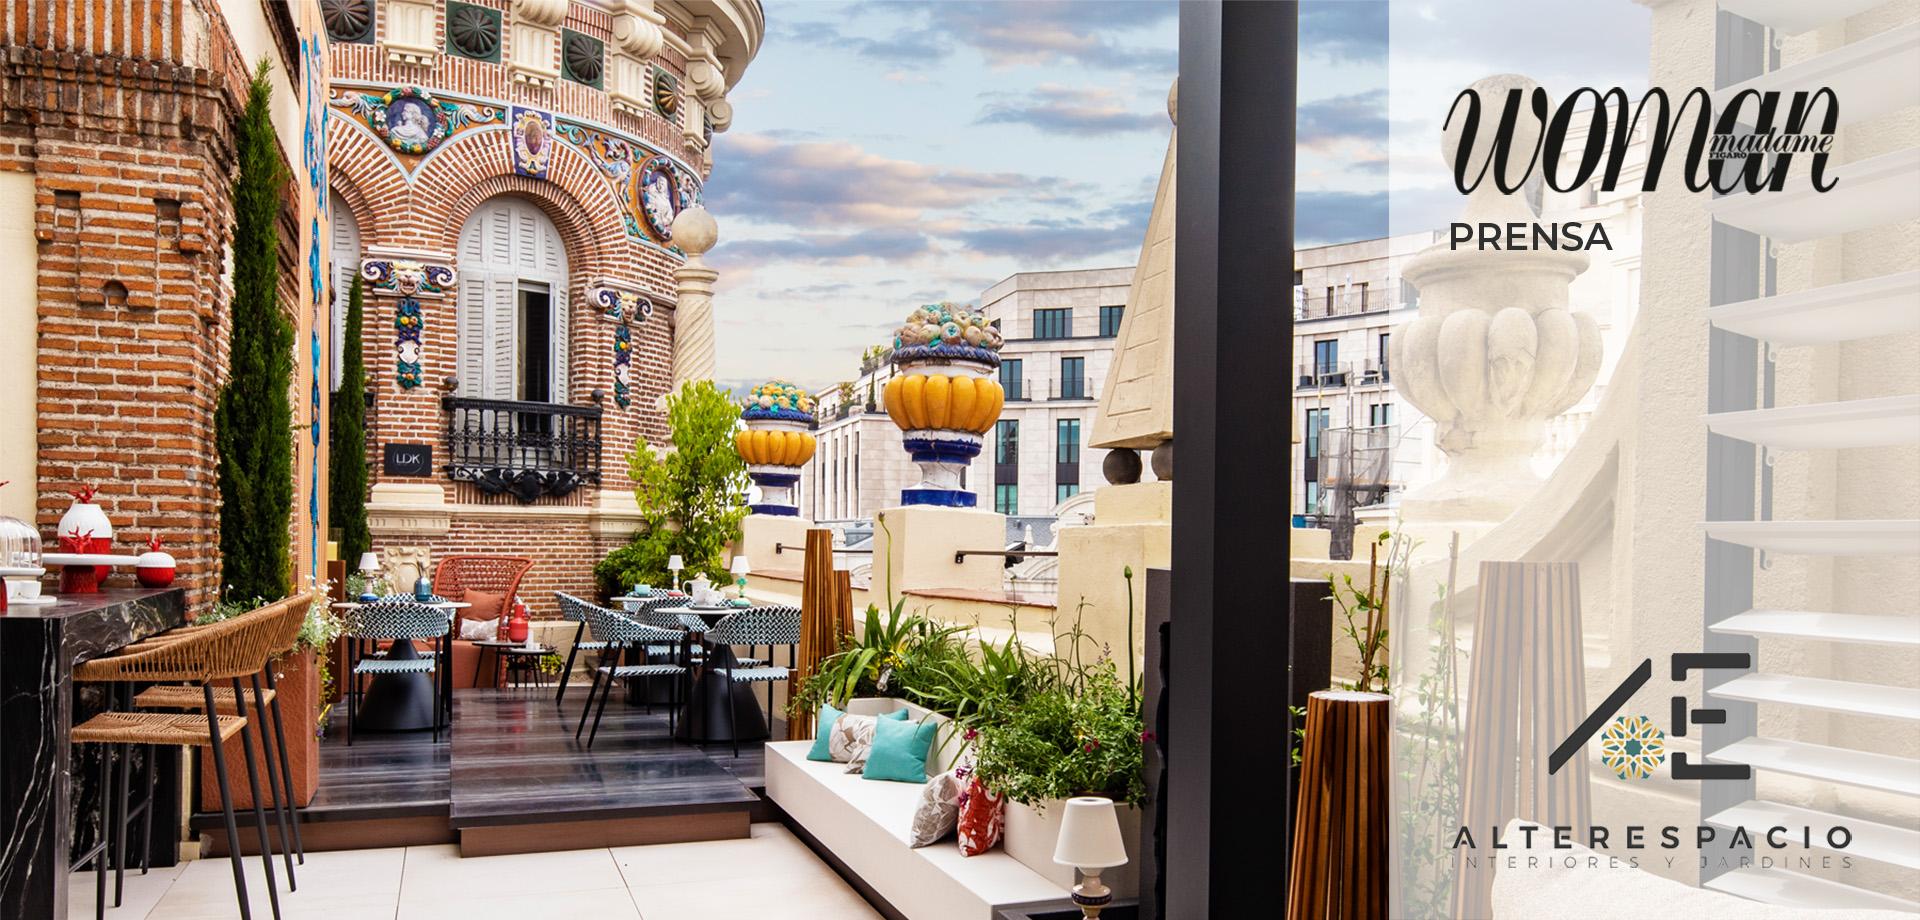 Prensa_Woman_LDK_Casadecor-2021_terraza_Alterespacio_decoración-de-jardines-terrazas_paisajismo-Madrid_PORTADA